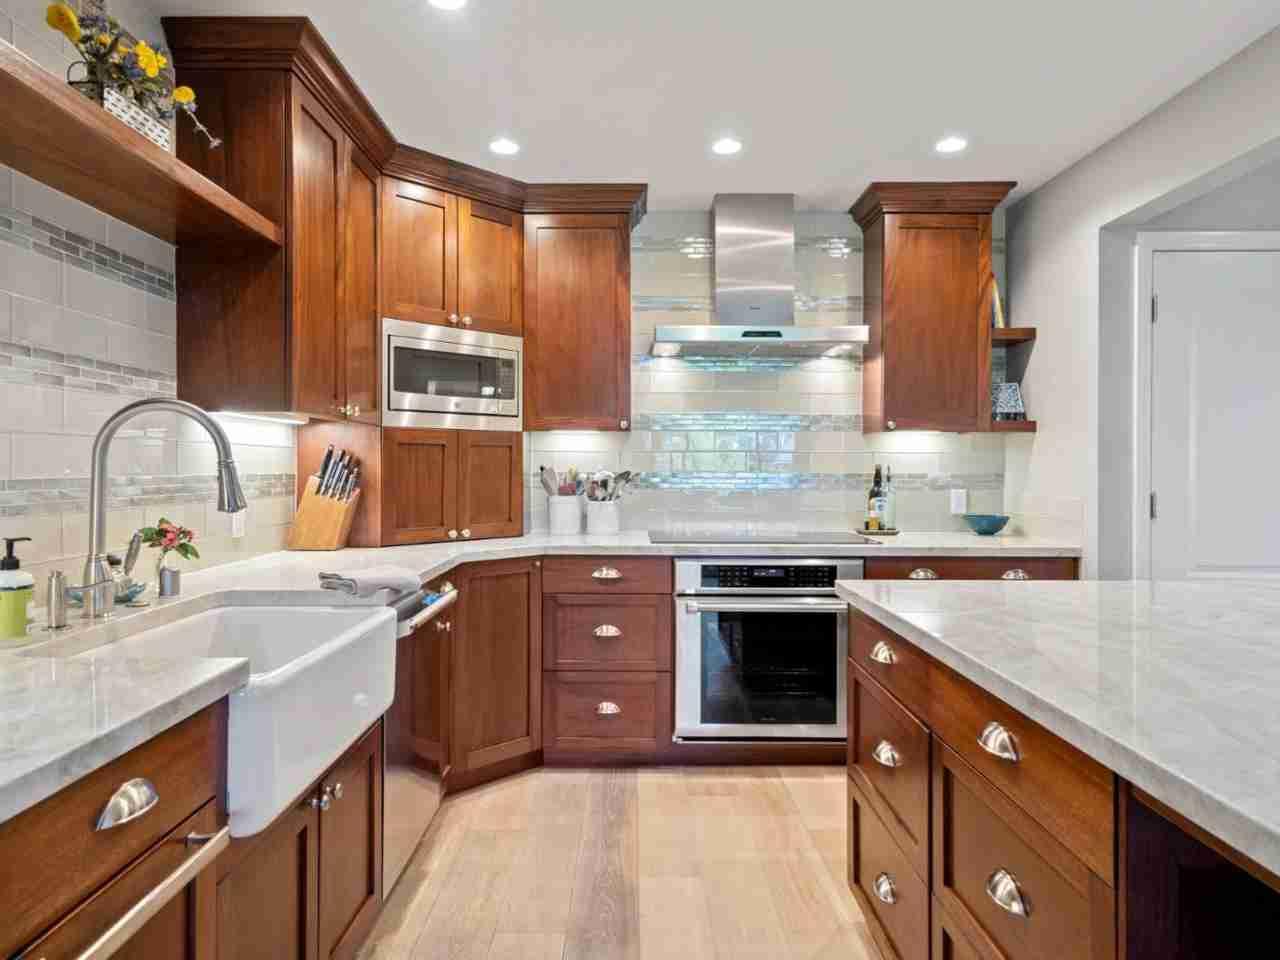 Kitchen, 2140 Santa Cruz Avenue #D107 Menlo Park, CA, 94025